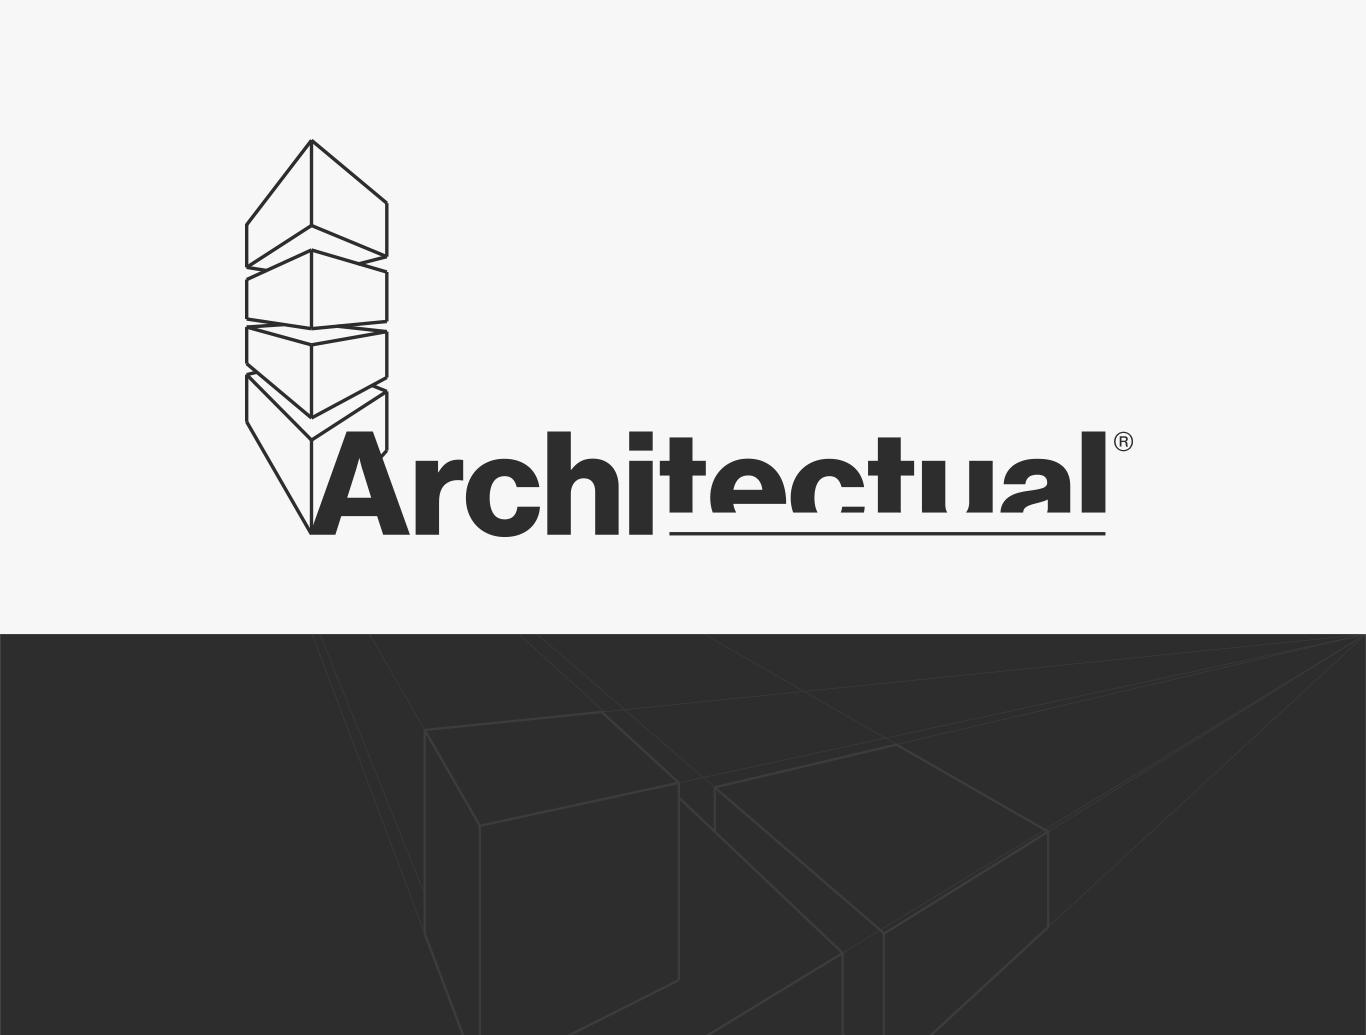 wordmark and symbol design